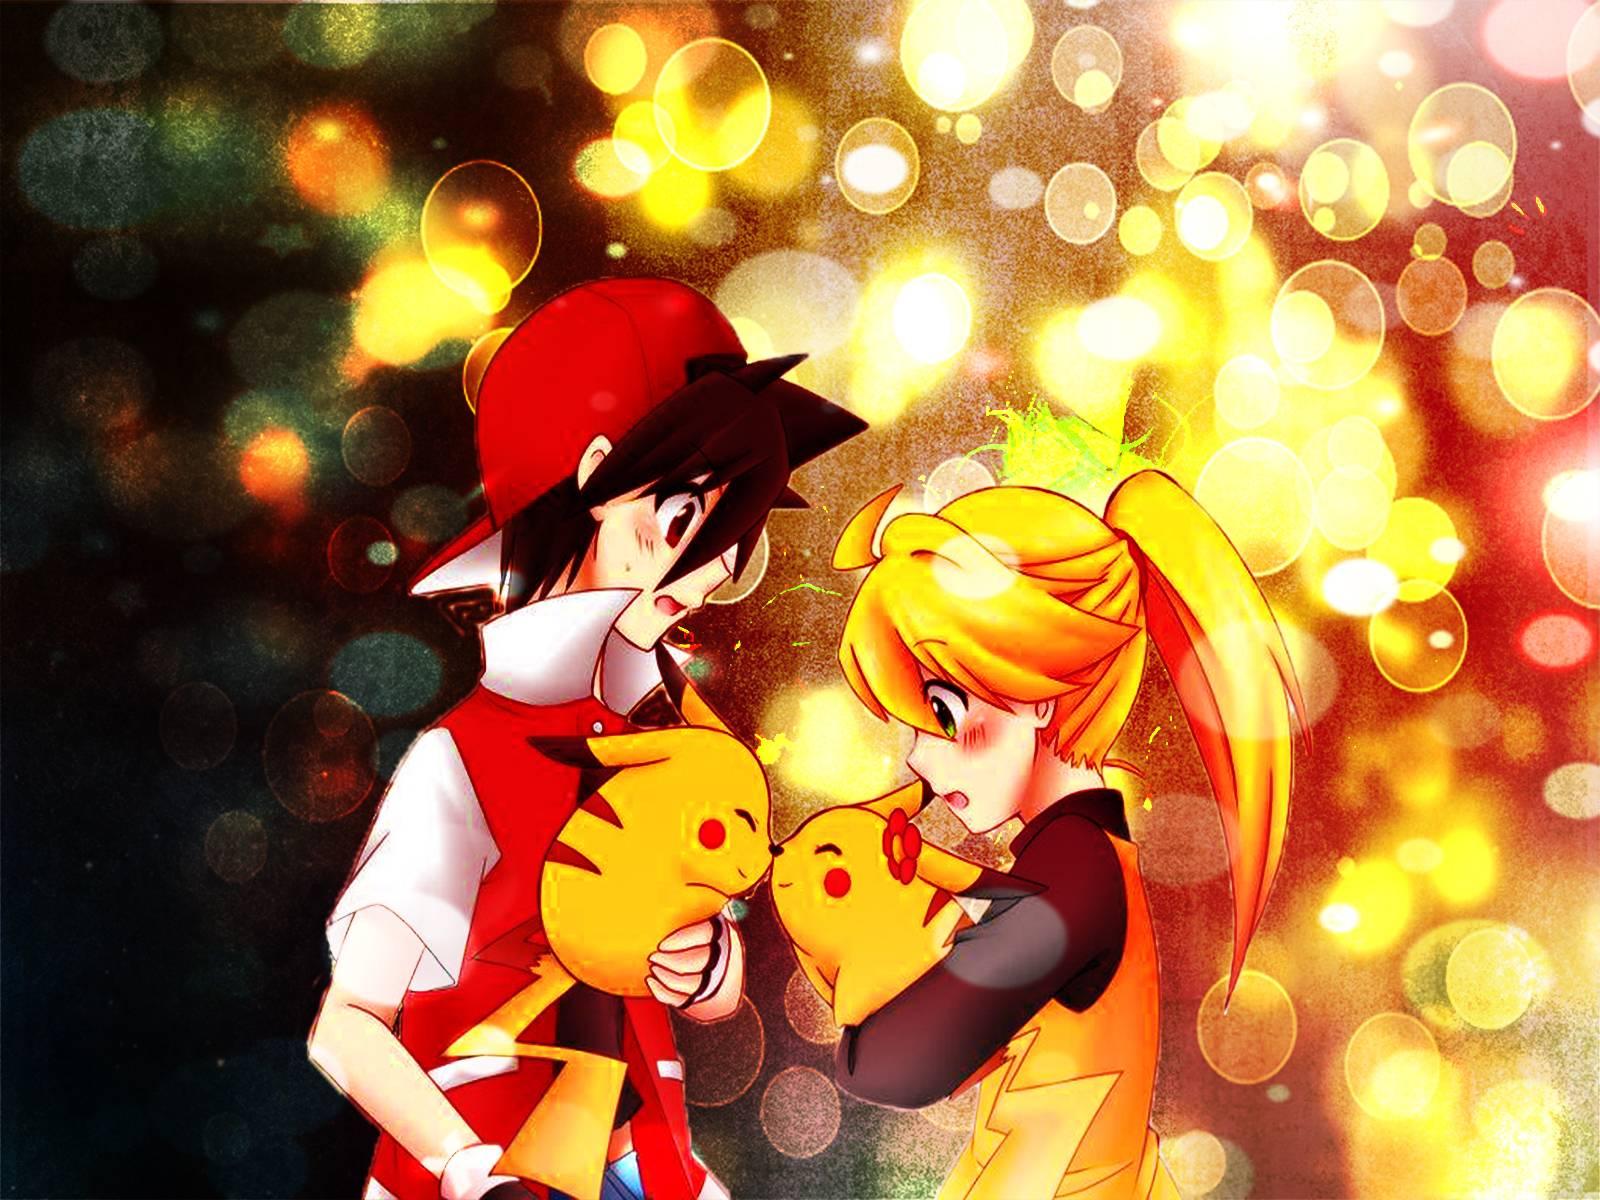 cute pokemon wallpaper 5599 - photo #33